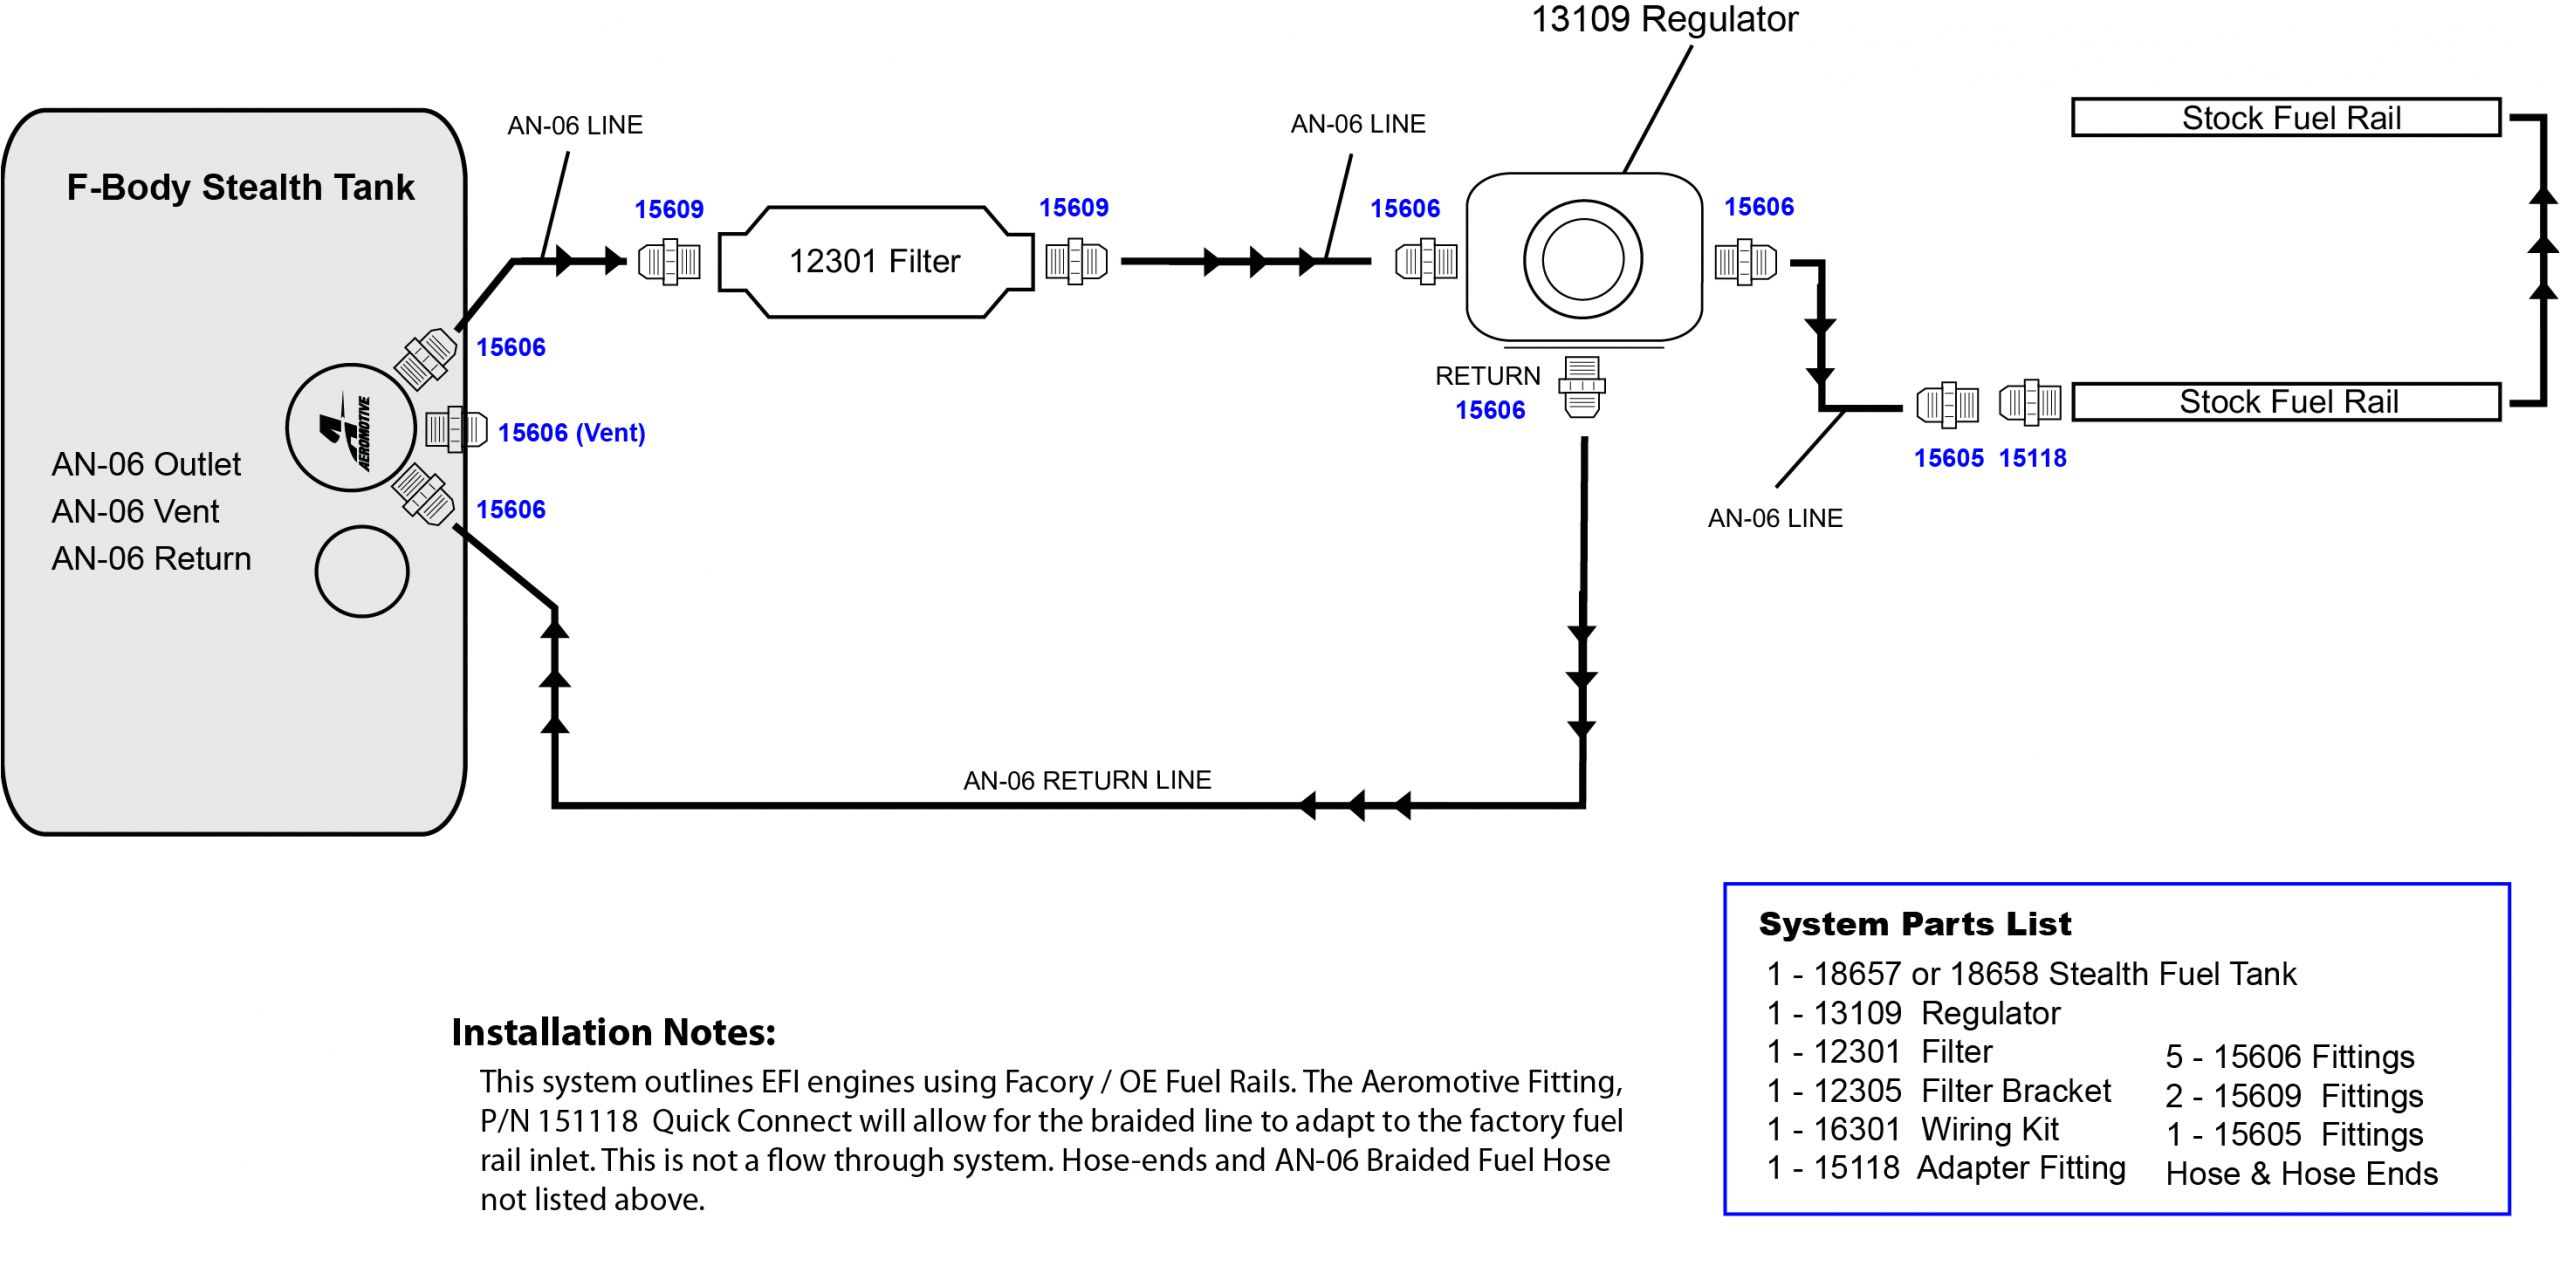 f body stealth plumbing diagram 1b jpg